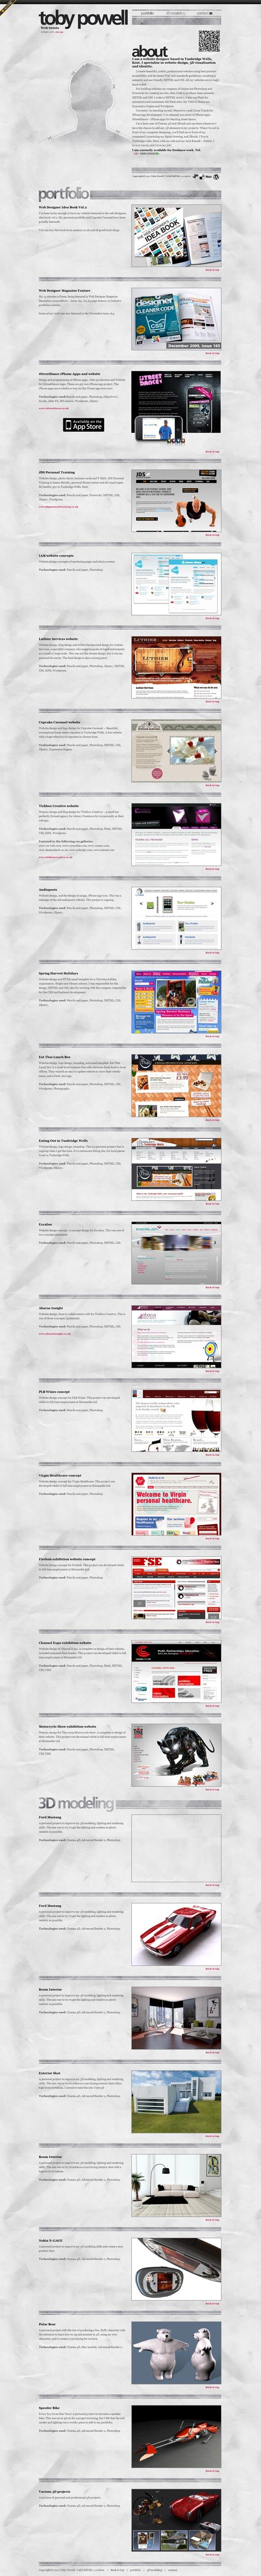 Toby Powell | Web Designer